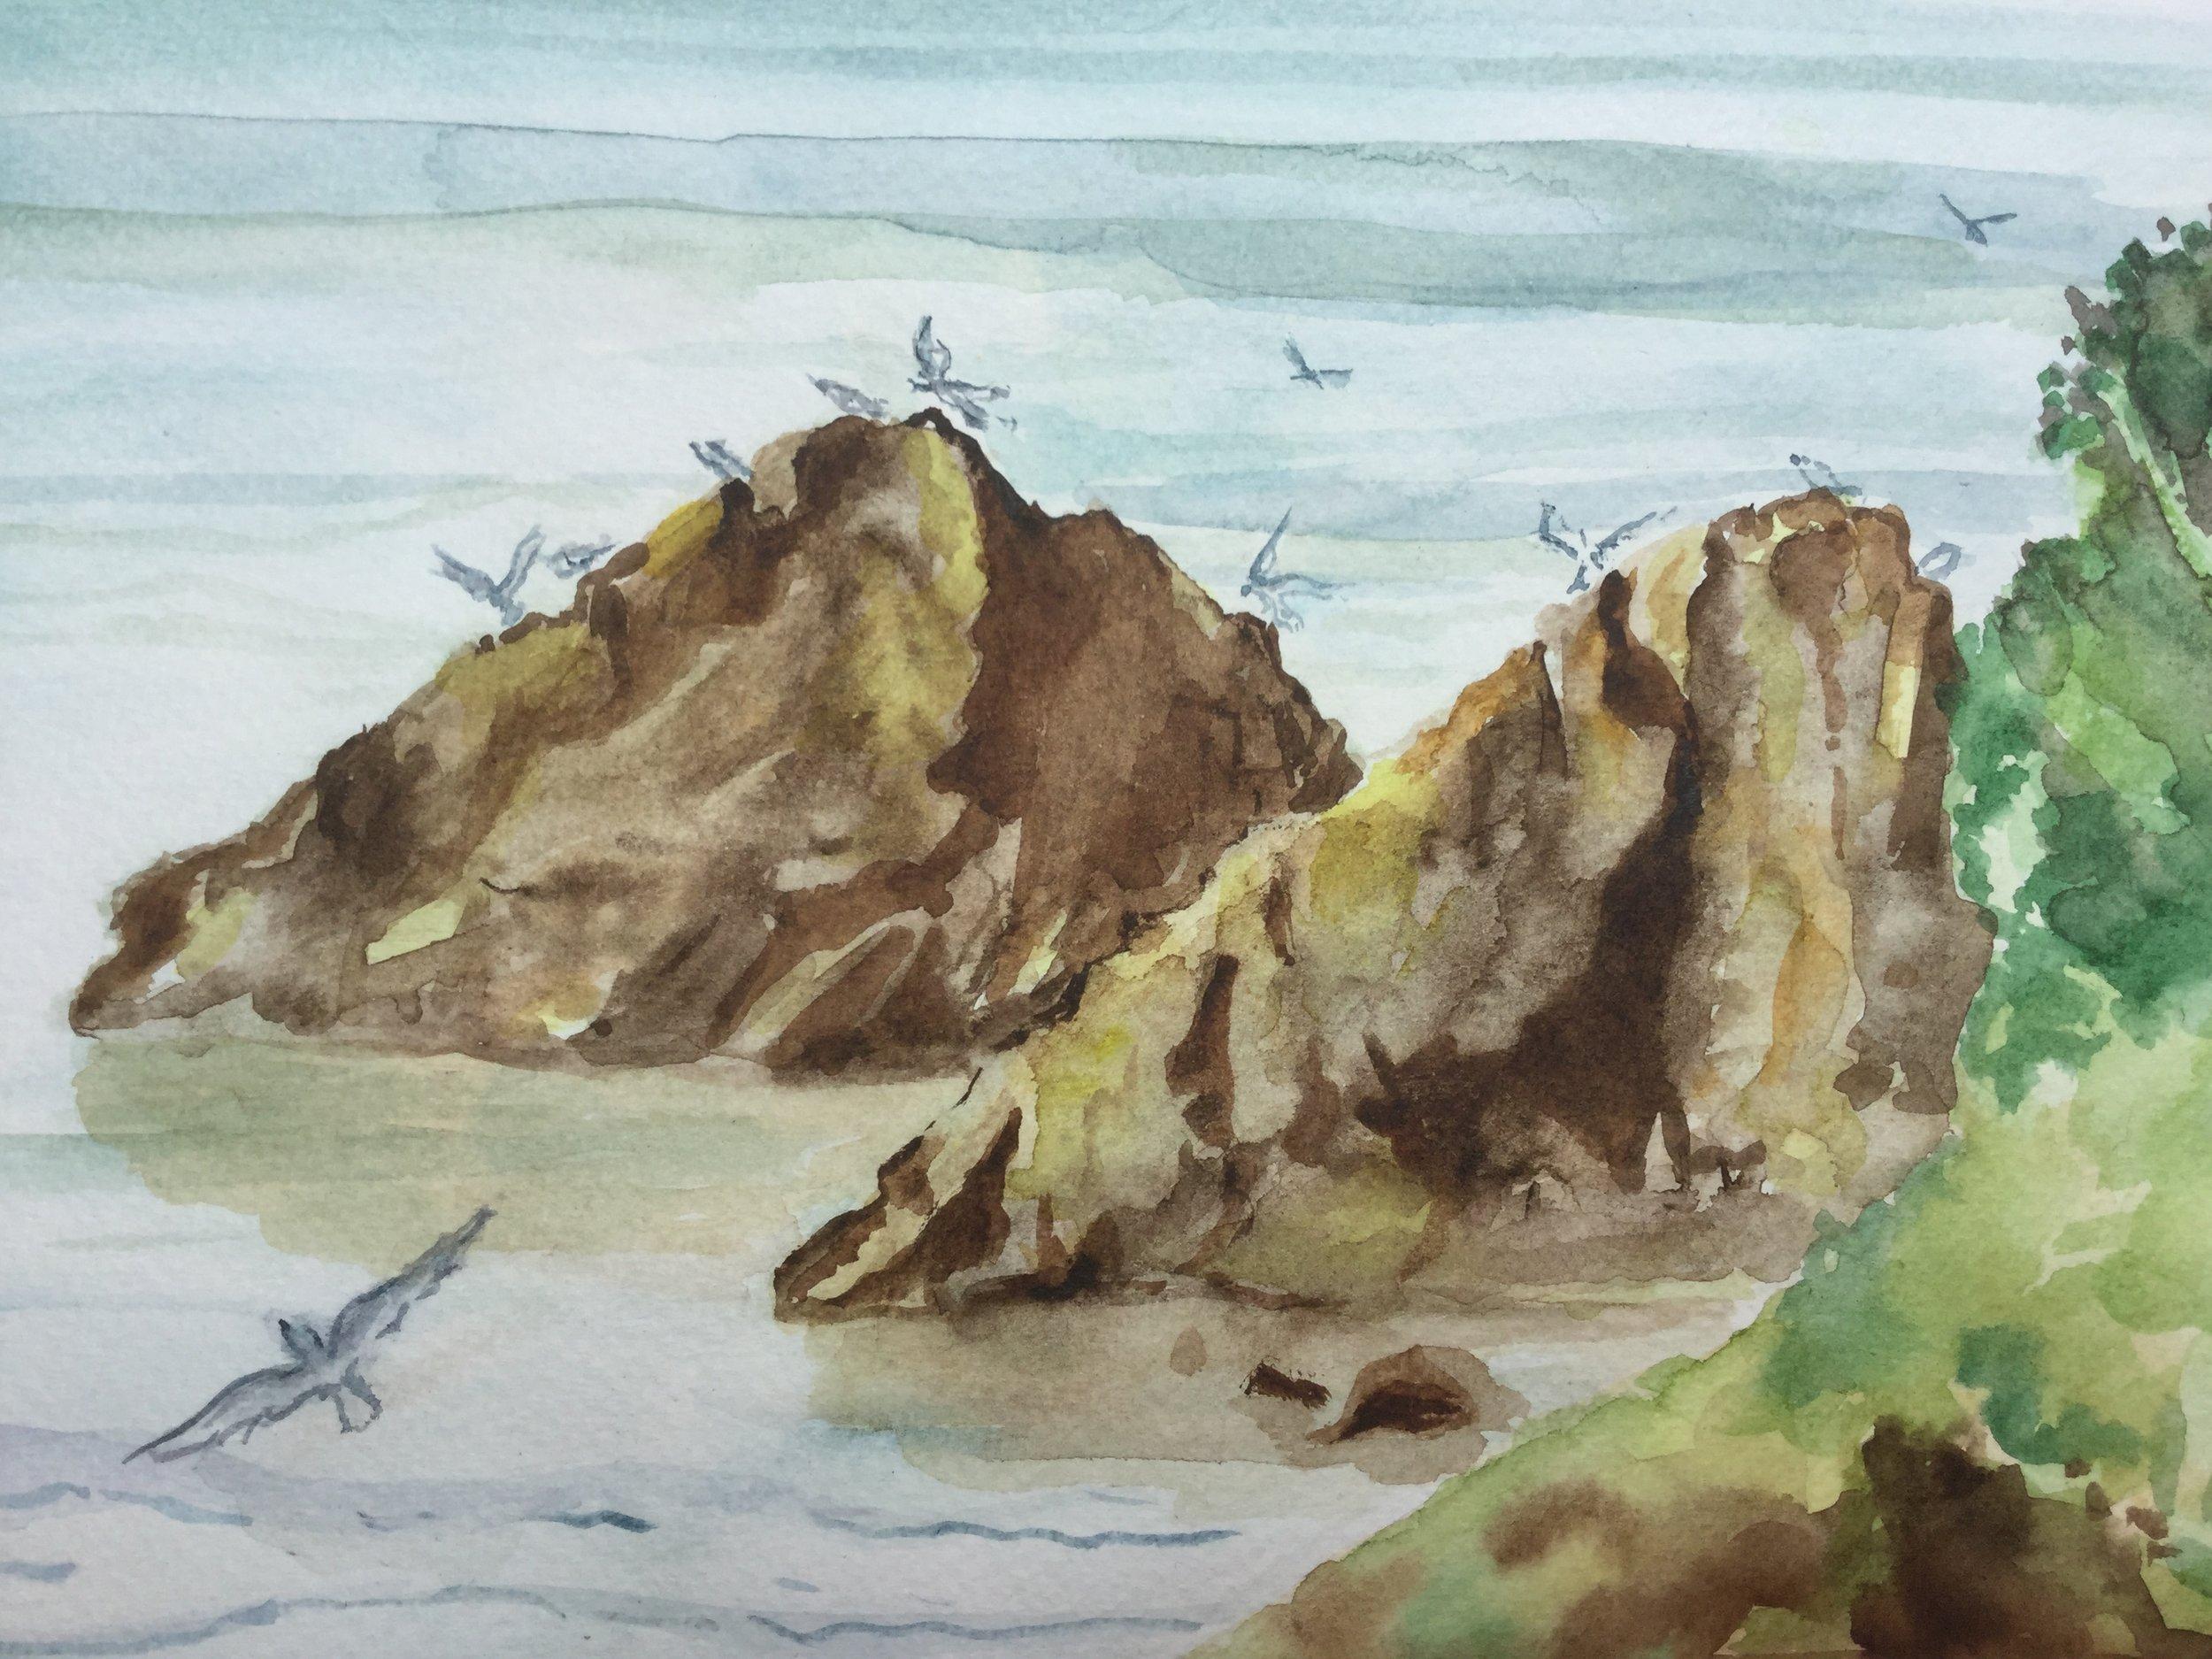 Caswell Bay Rocks